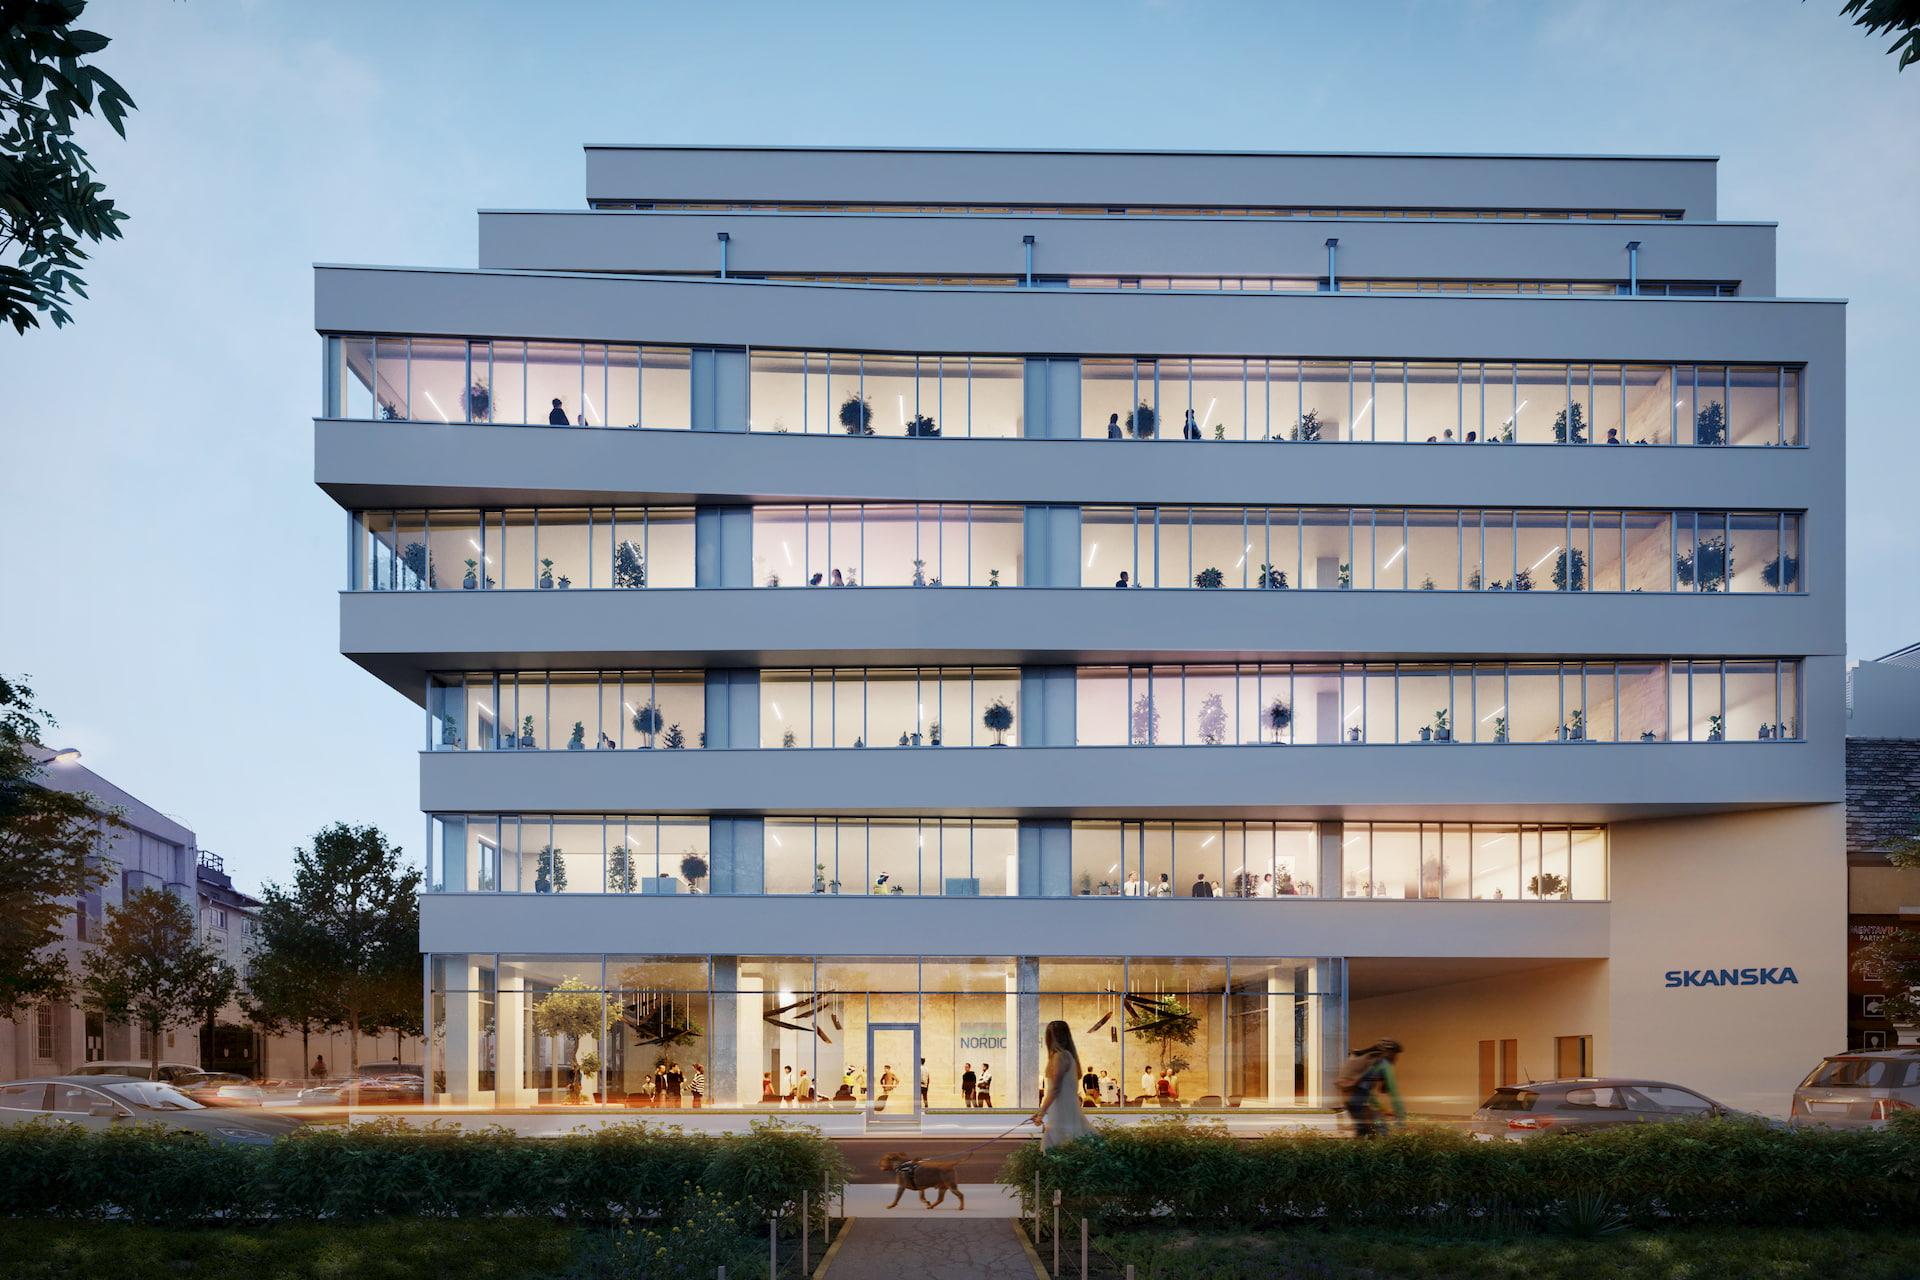 Beautiful Architectural Renderings for Skanska Office Development Hungary Night Warm Light